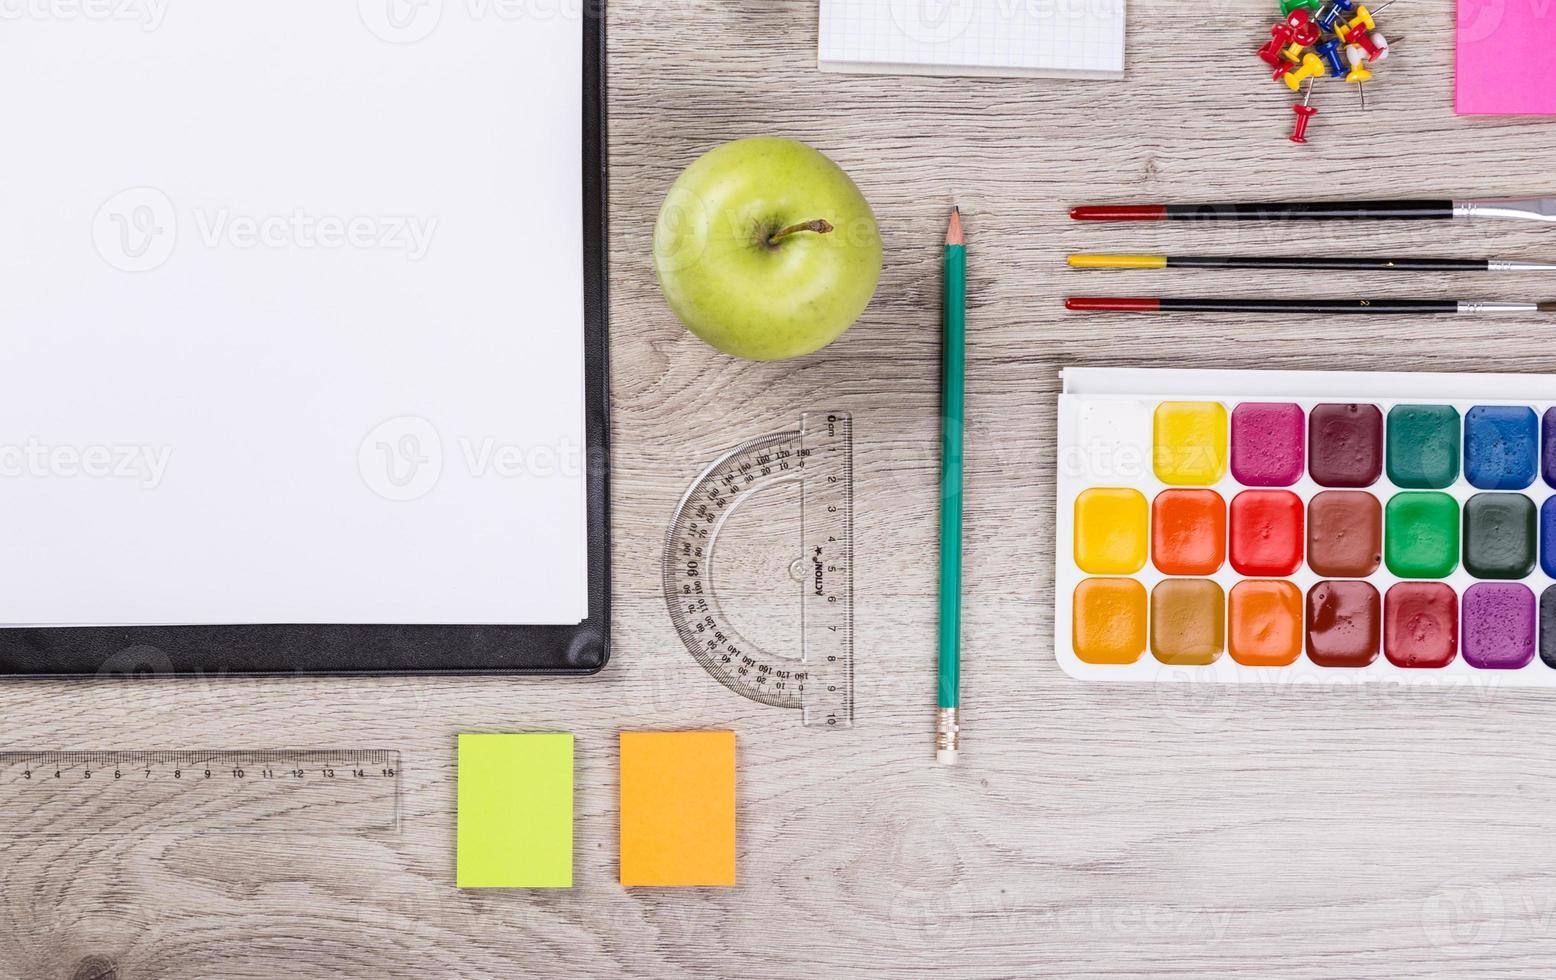 papel, lápices, pincel, manzana verde sobre mesa de madera foto